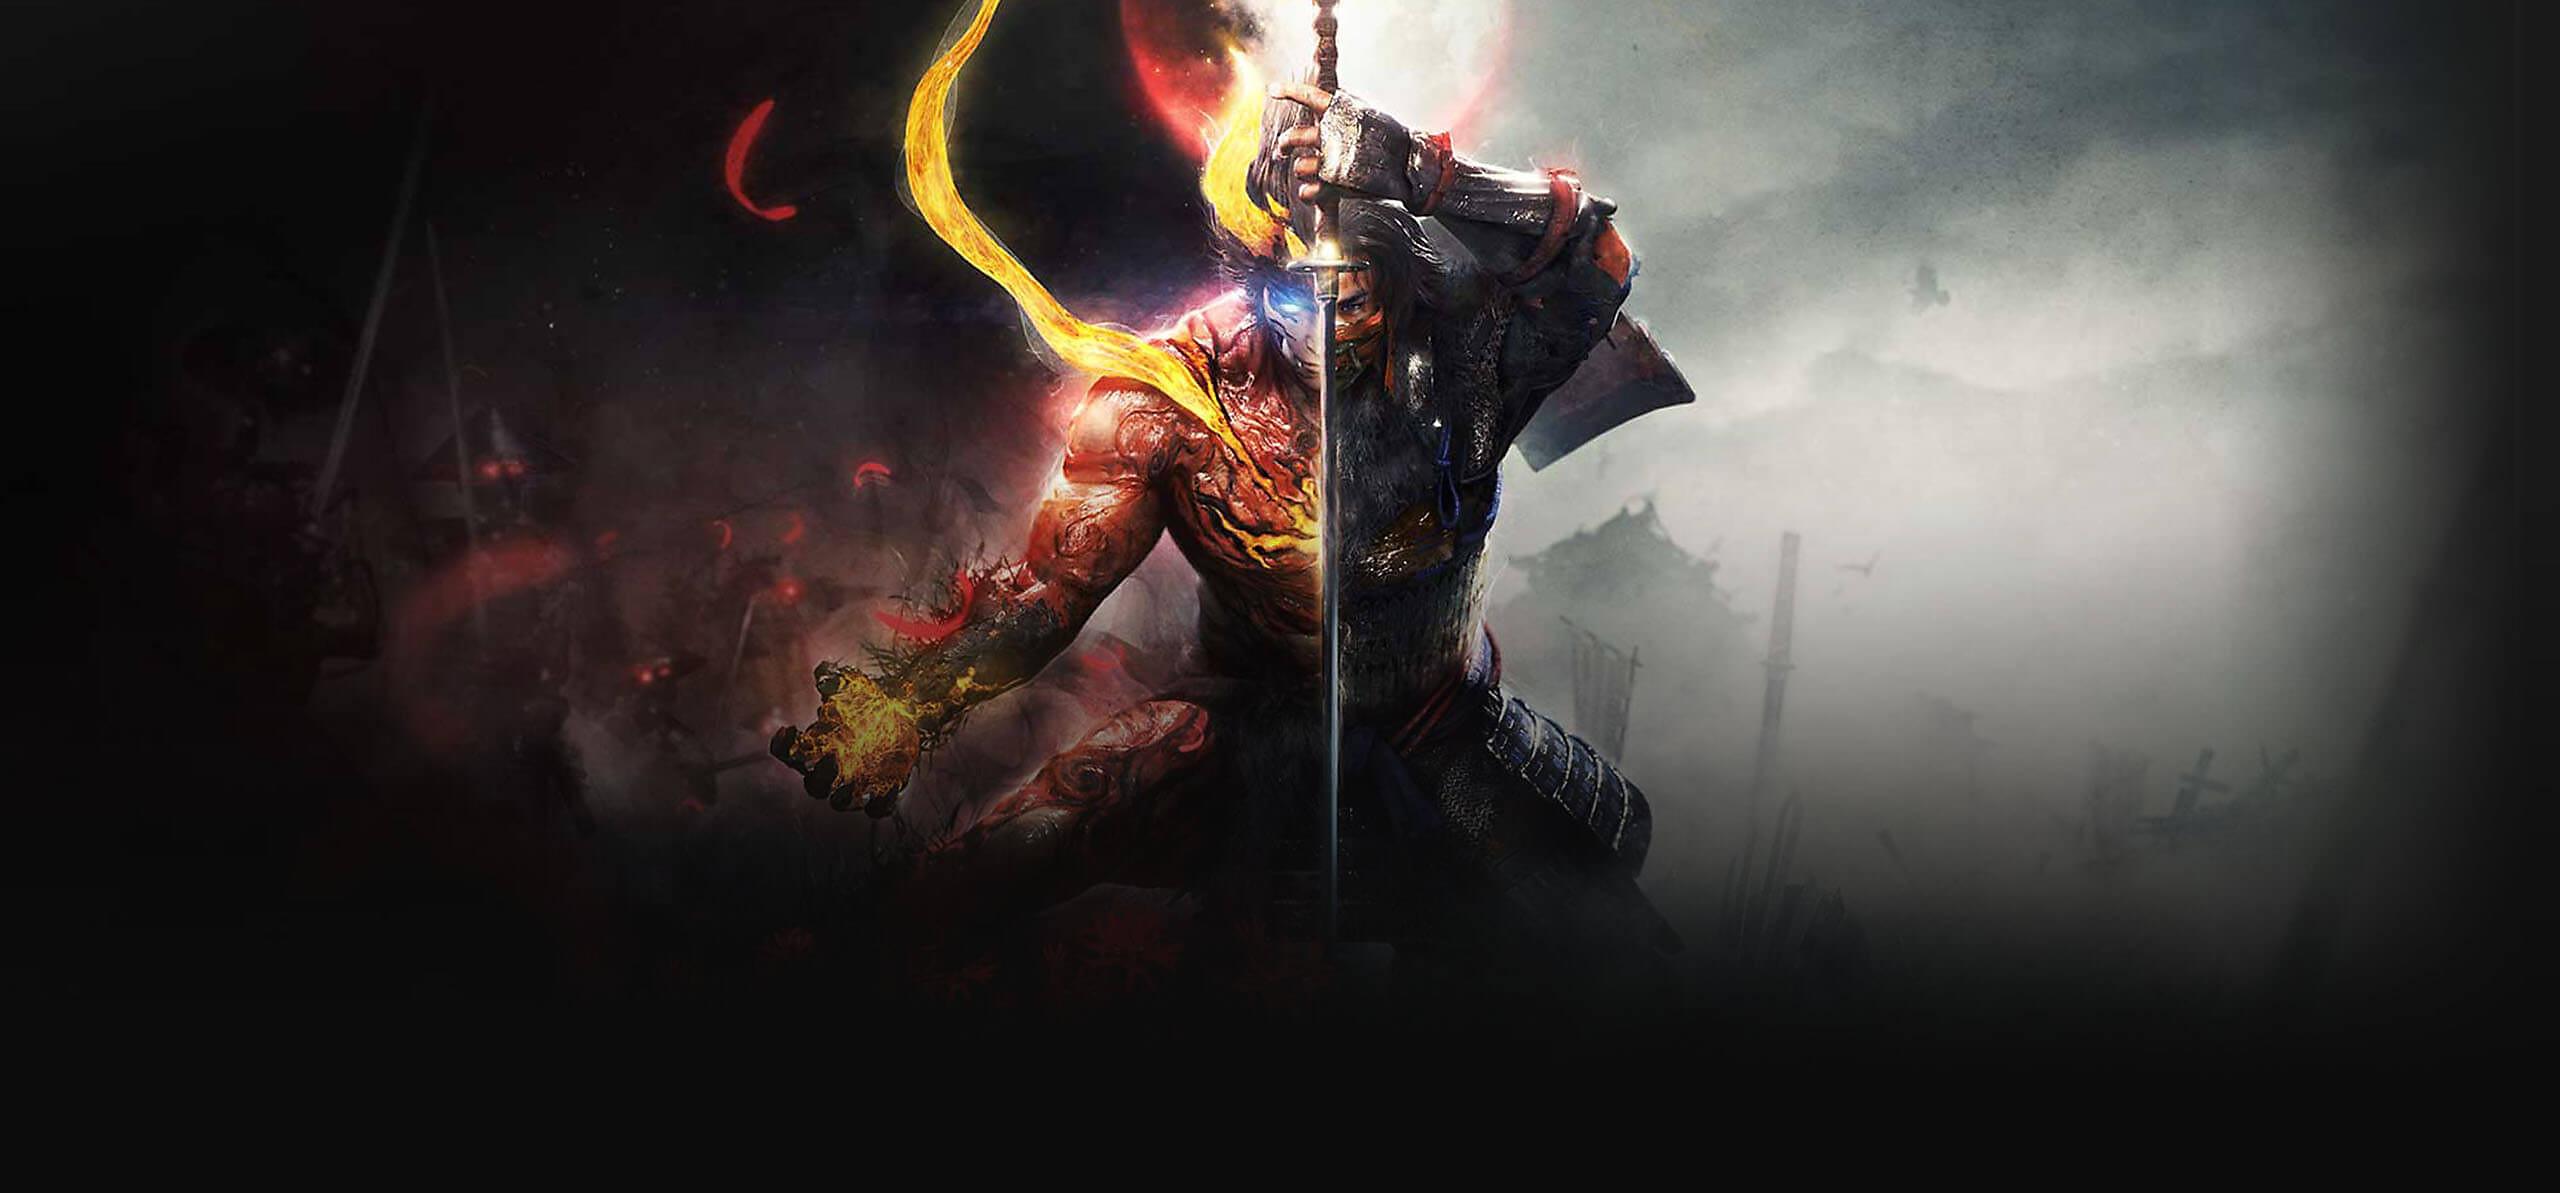 Nioh 2, Team Ninja, Dark Souls, Weapons, Combat